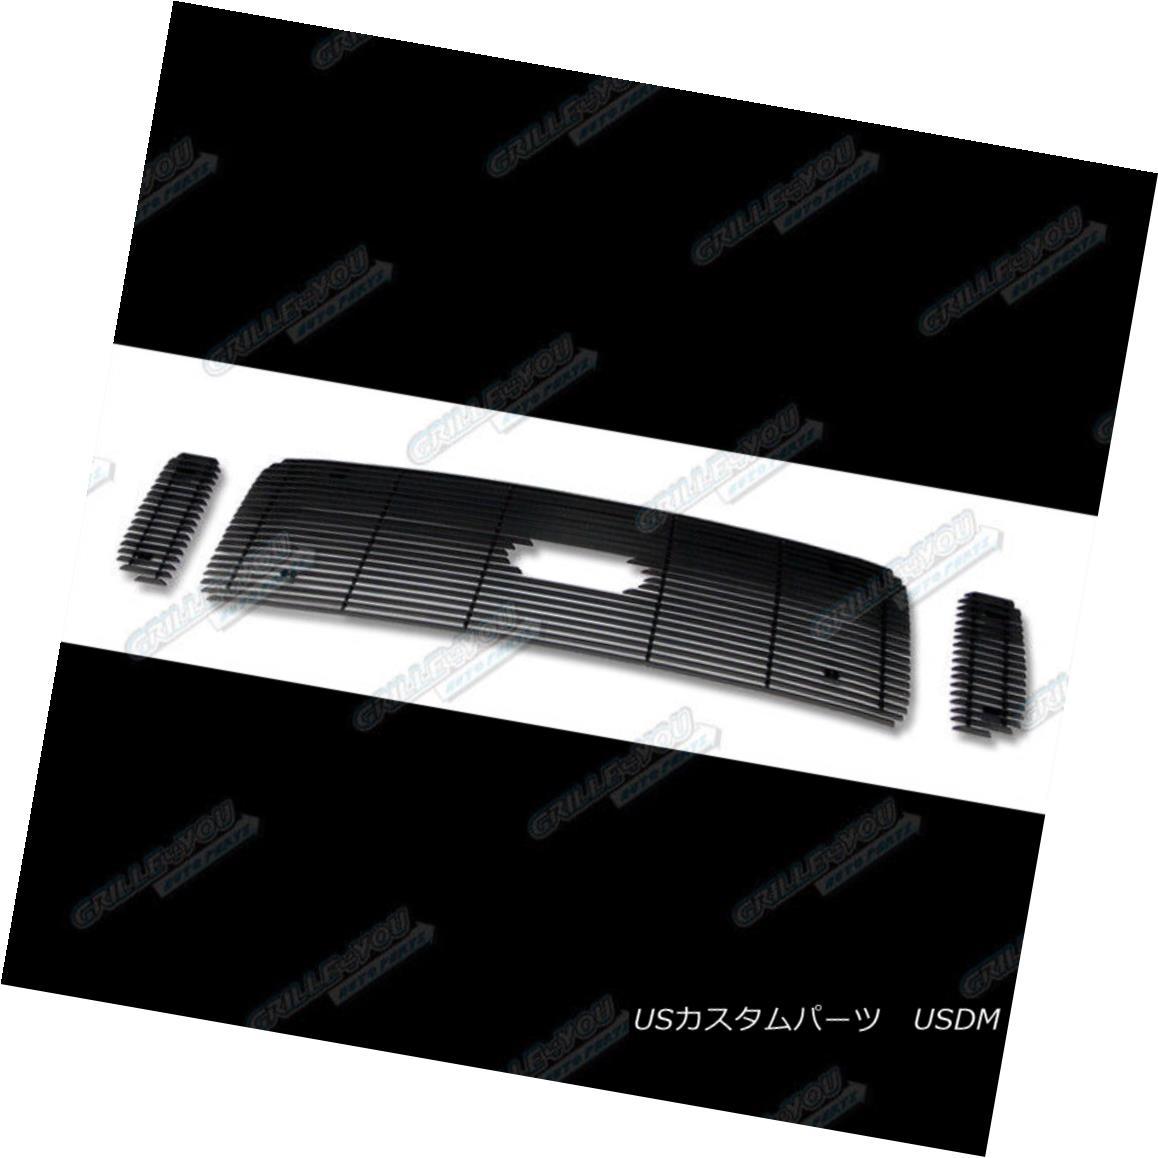 APS Compatible with 1999-2004 Ford F250 F350 Excursion Black Billet Grille N19-H70756F